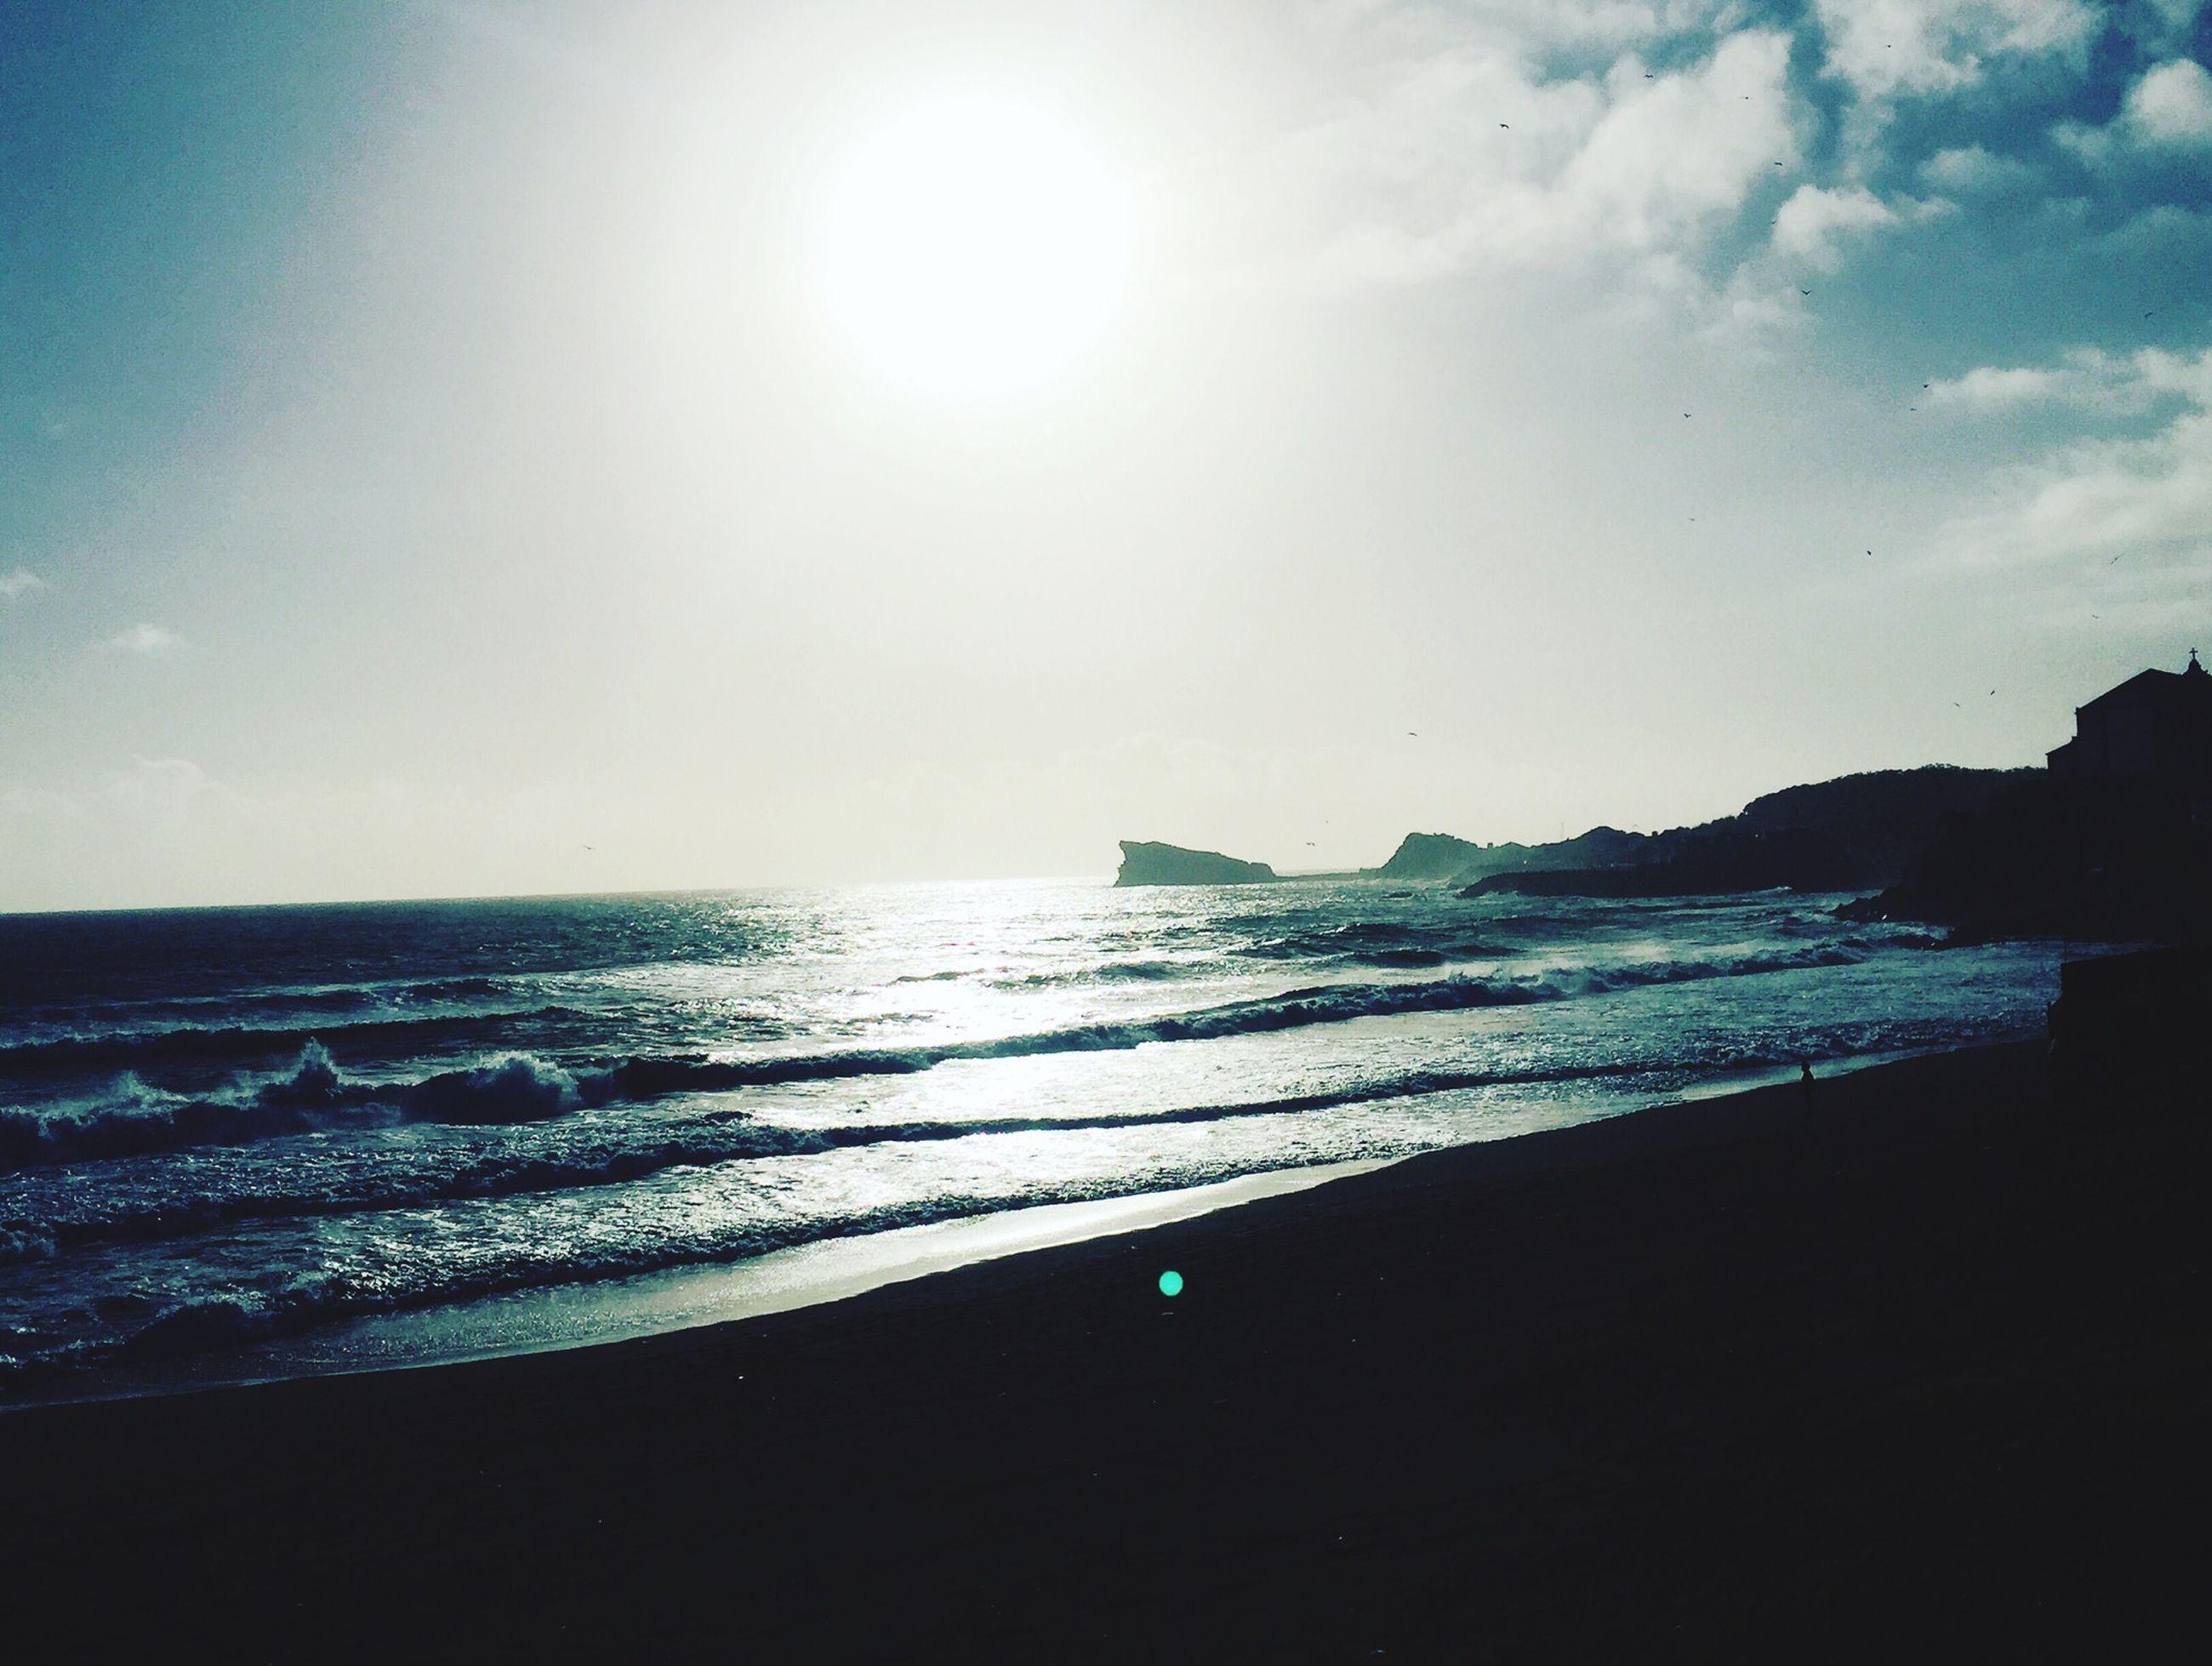 sea, water, horizon over water, tranquil scene, scenics, tranquility, beauty in nature, beach, sky, shore, sun, nature, idyllic, reflection, sunlight, calm, coastline, blue, seascape, outdoors